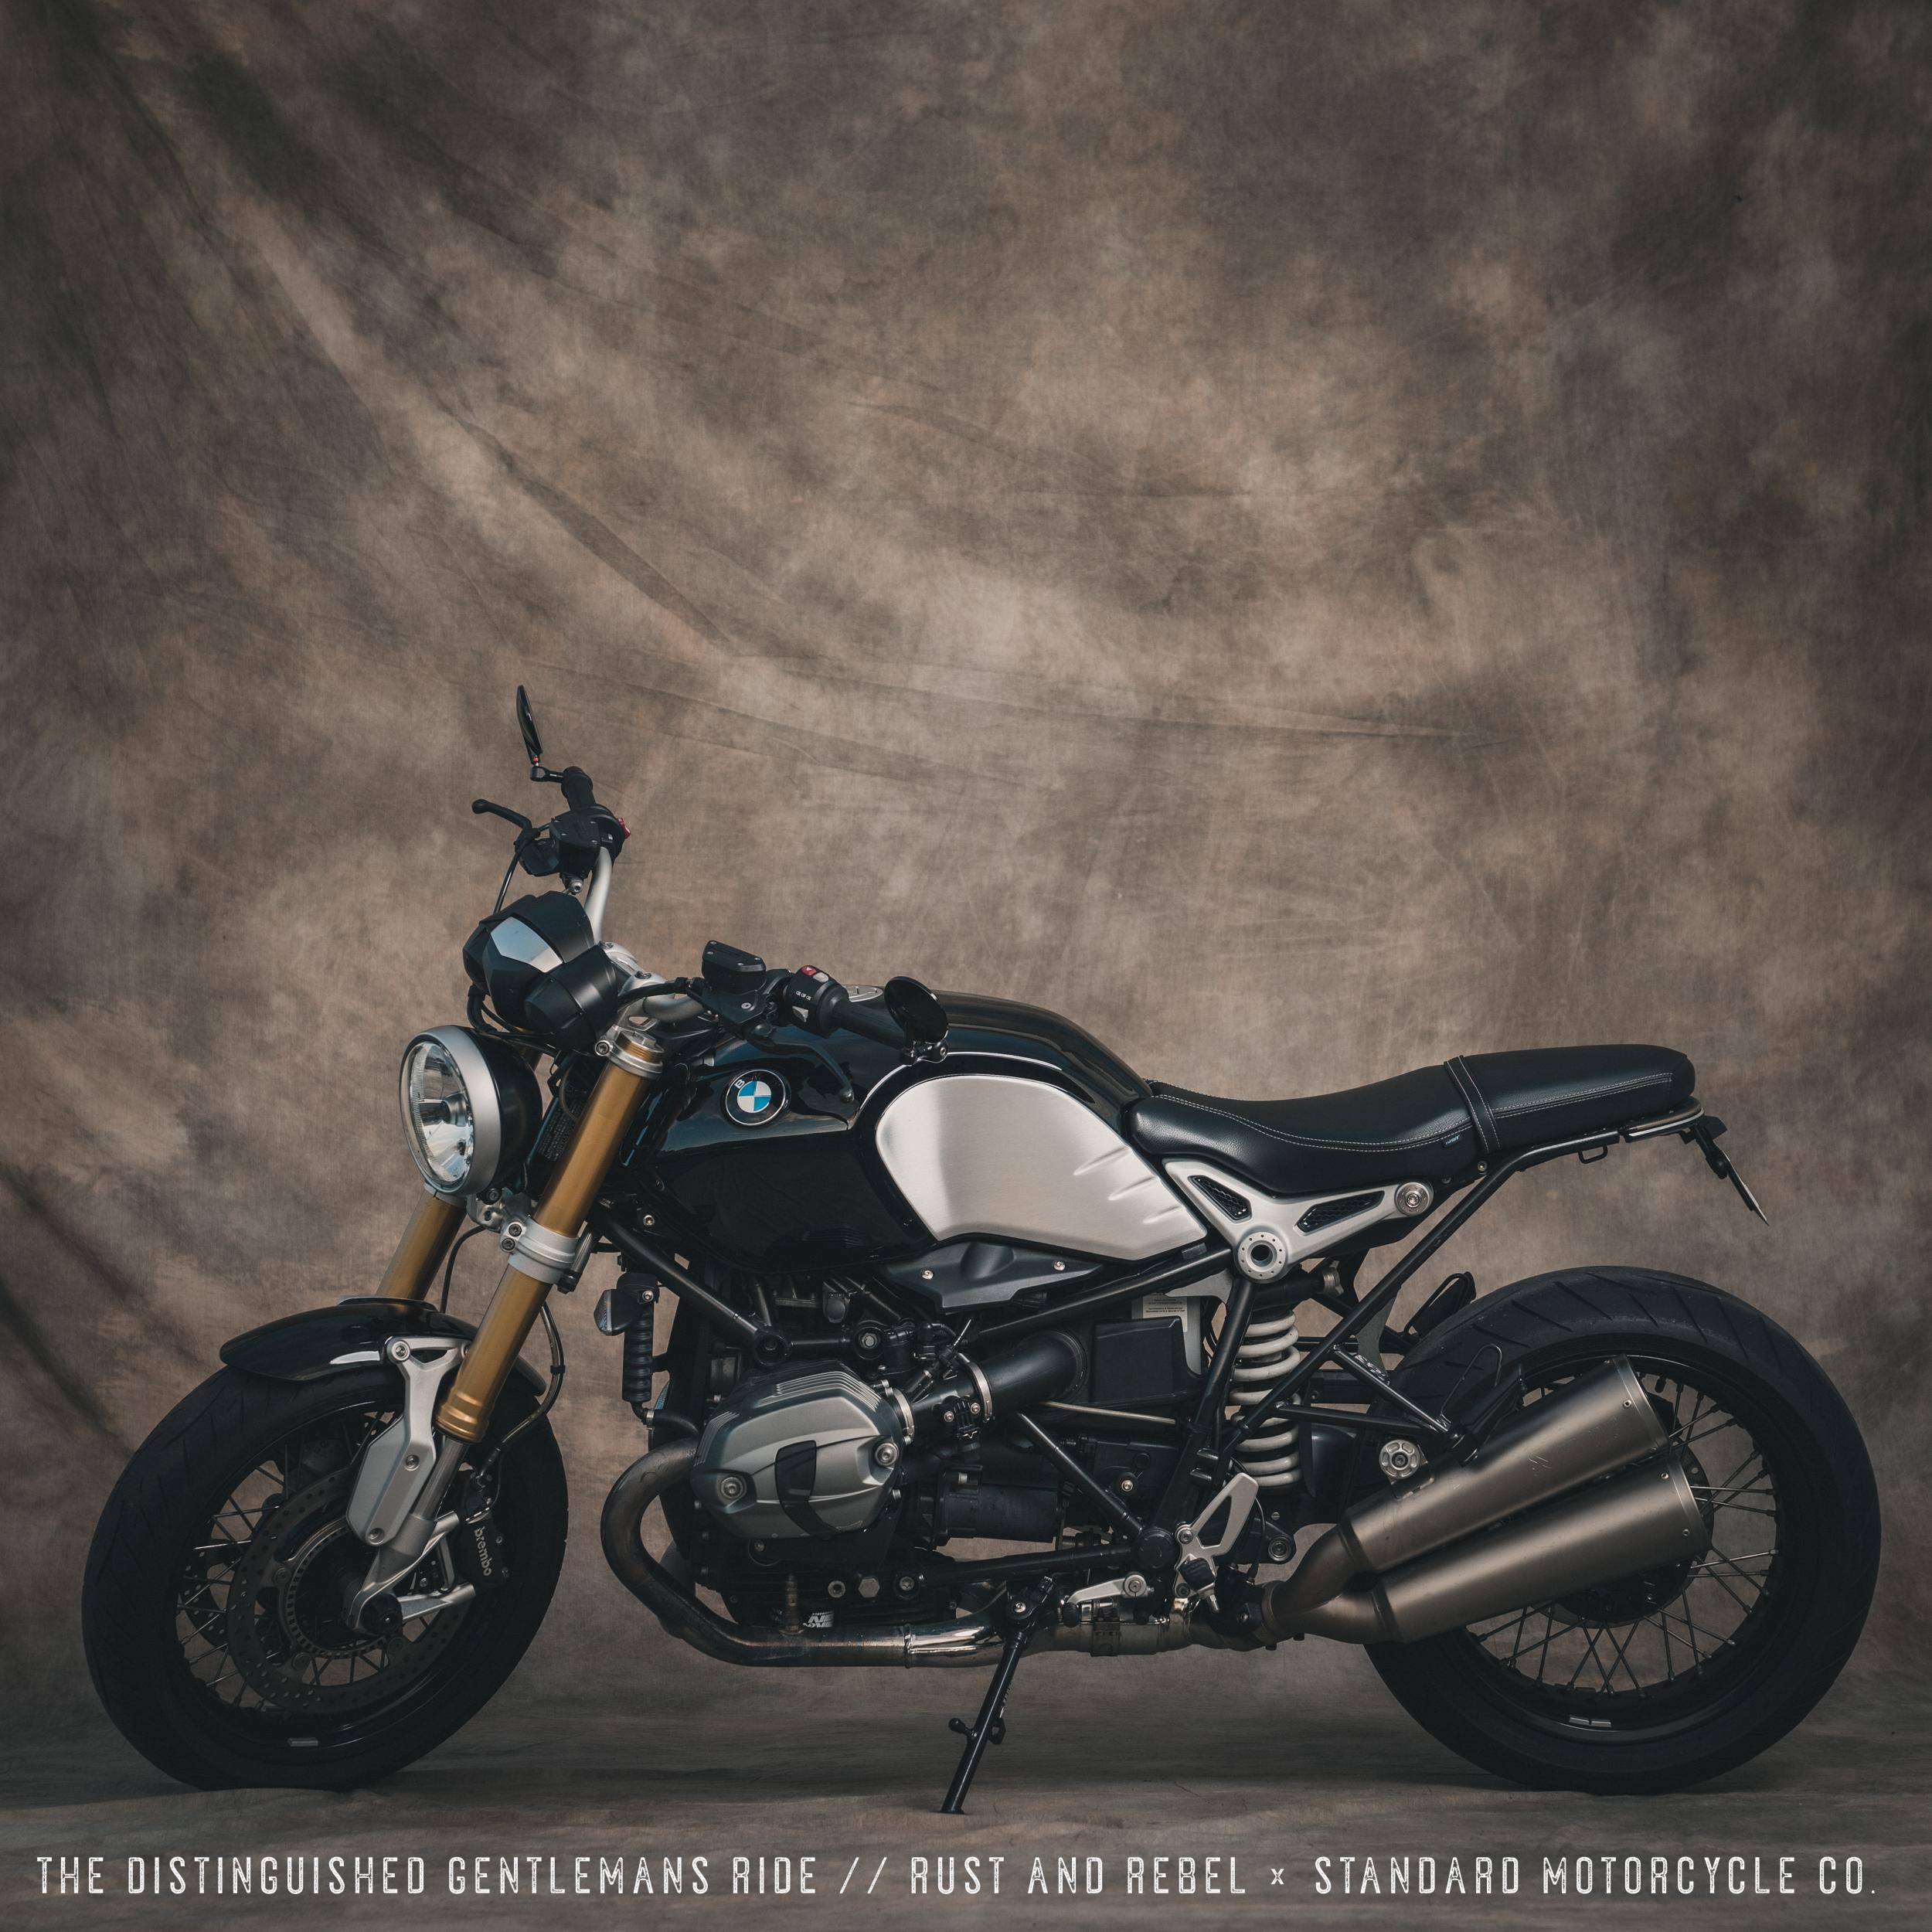 The Distinguished Gentleman's Ride 2019 [BIKES - PHOTO BY @MIKEDUNNUSA] - 0005.jpg